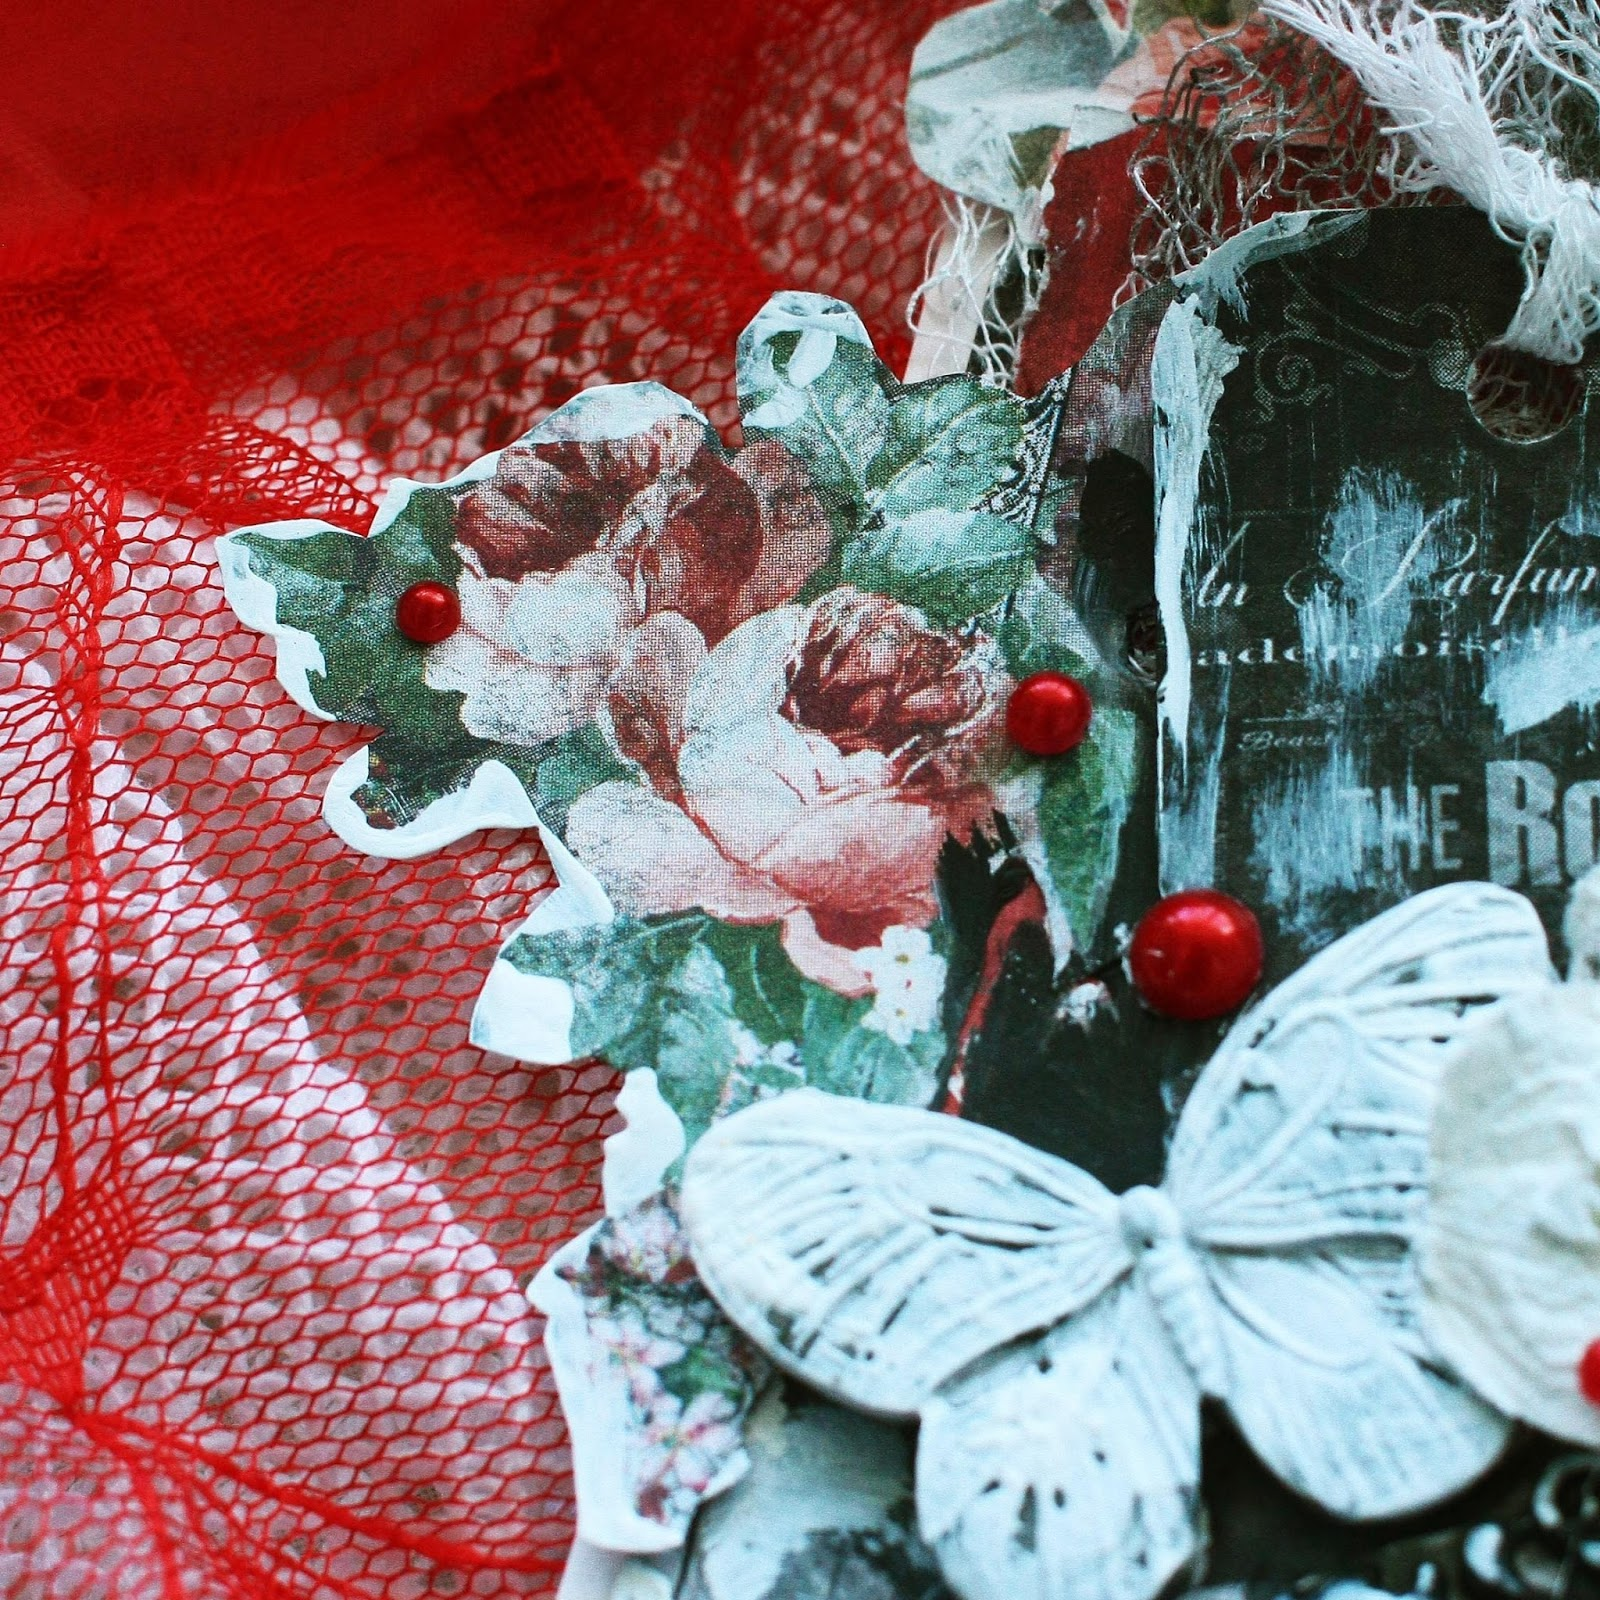 элегия,композиция в скрапе, композиция и скрапбукинг, Наташа Кузина